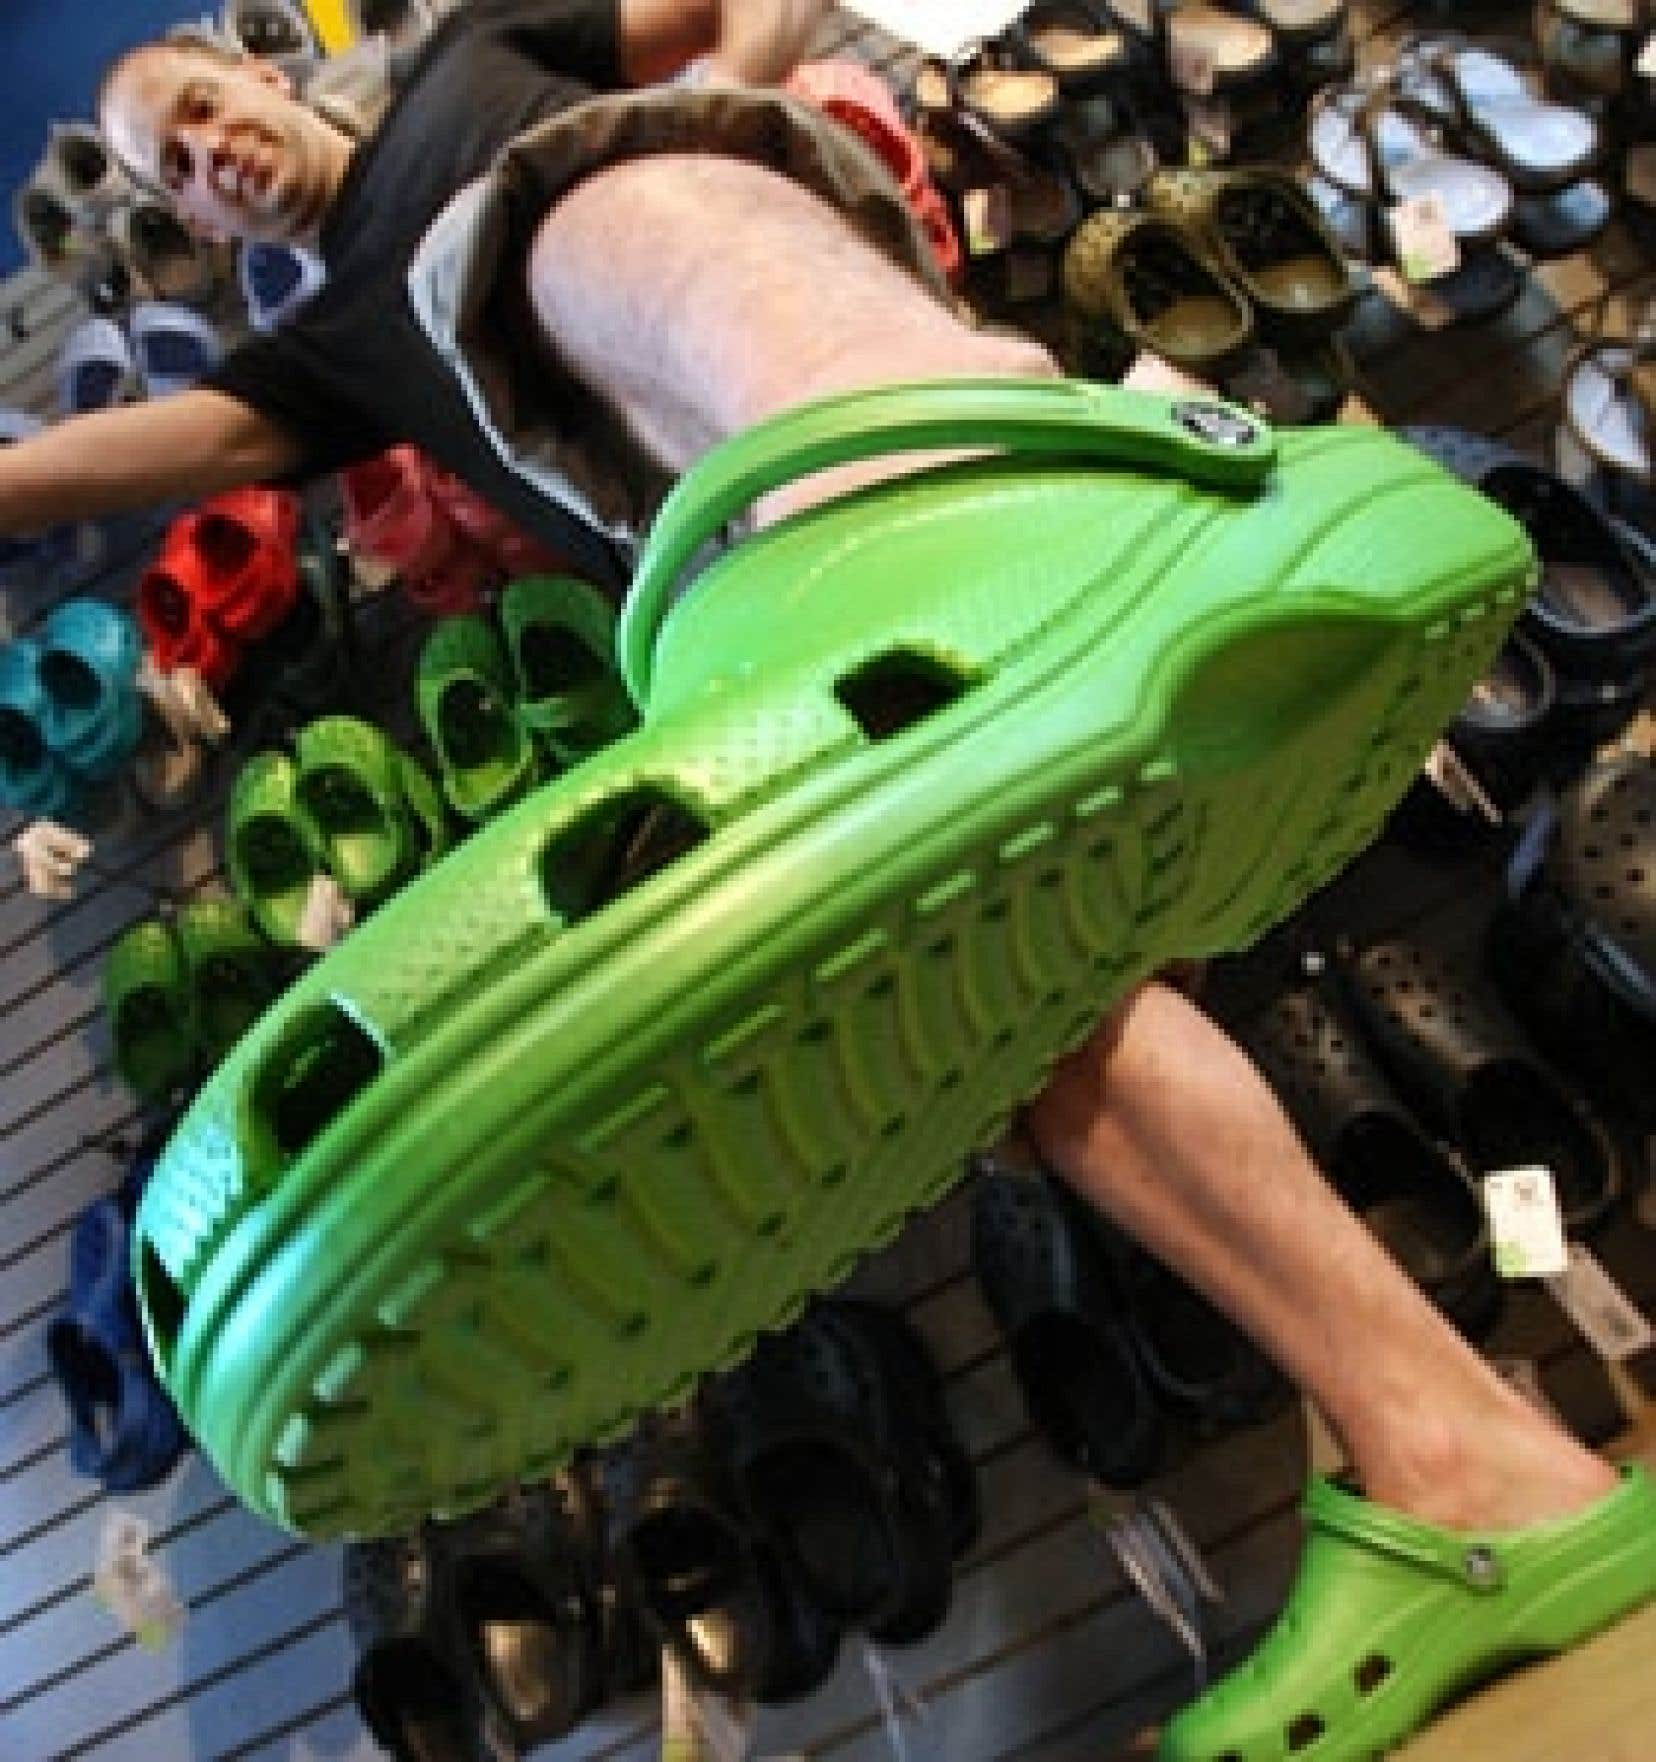 najniższa cena niskie ceny wykwintny styl Crocs: après le rêve québécois, le choc | Le Devoir